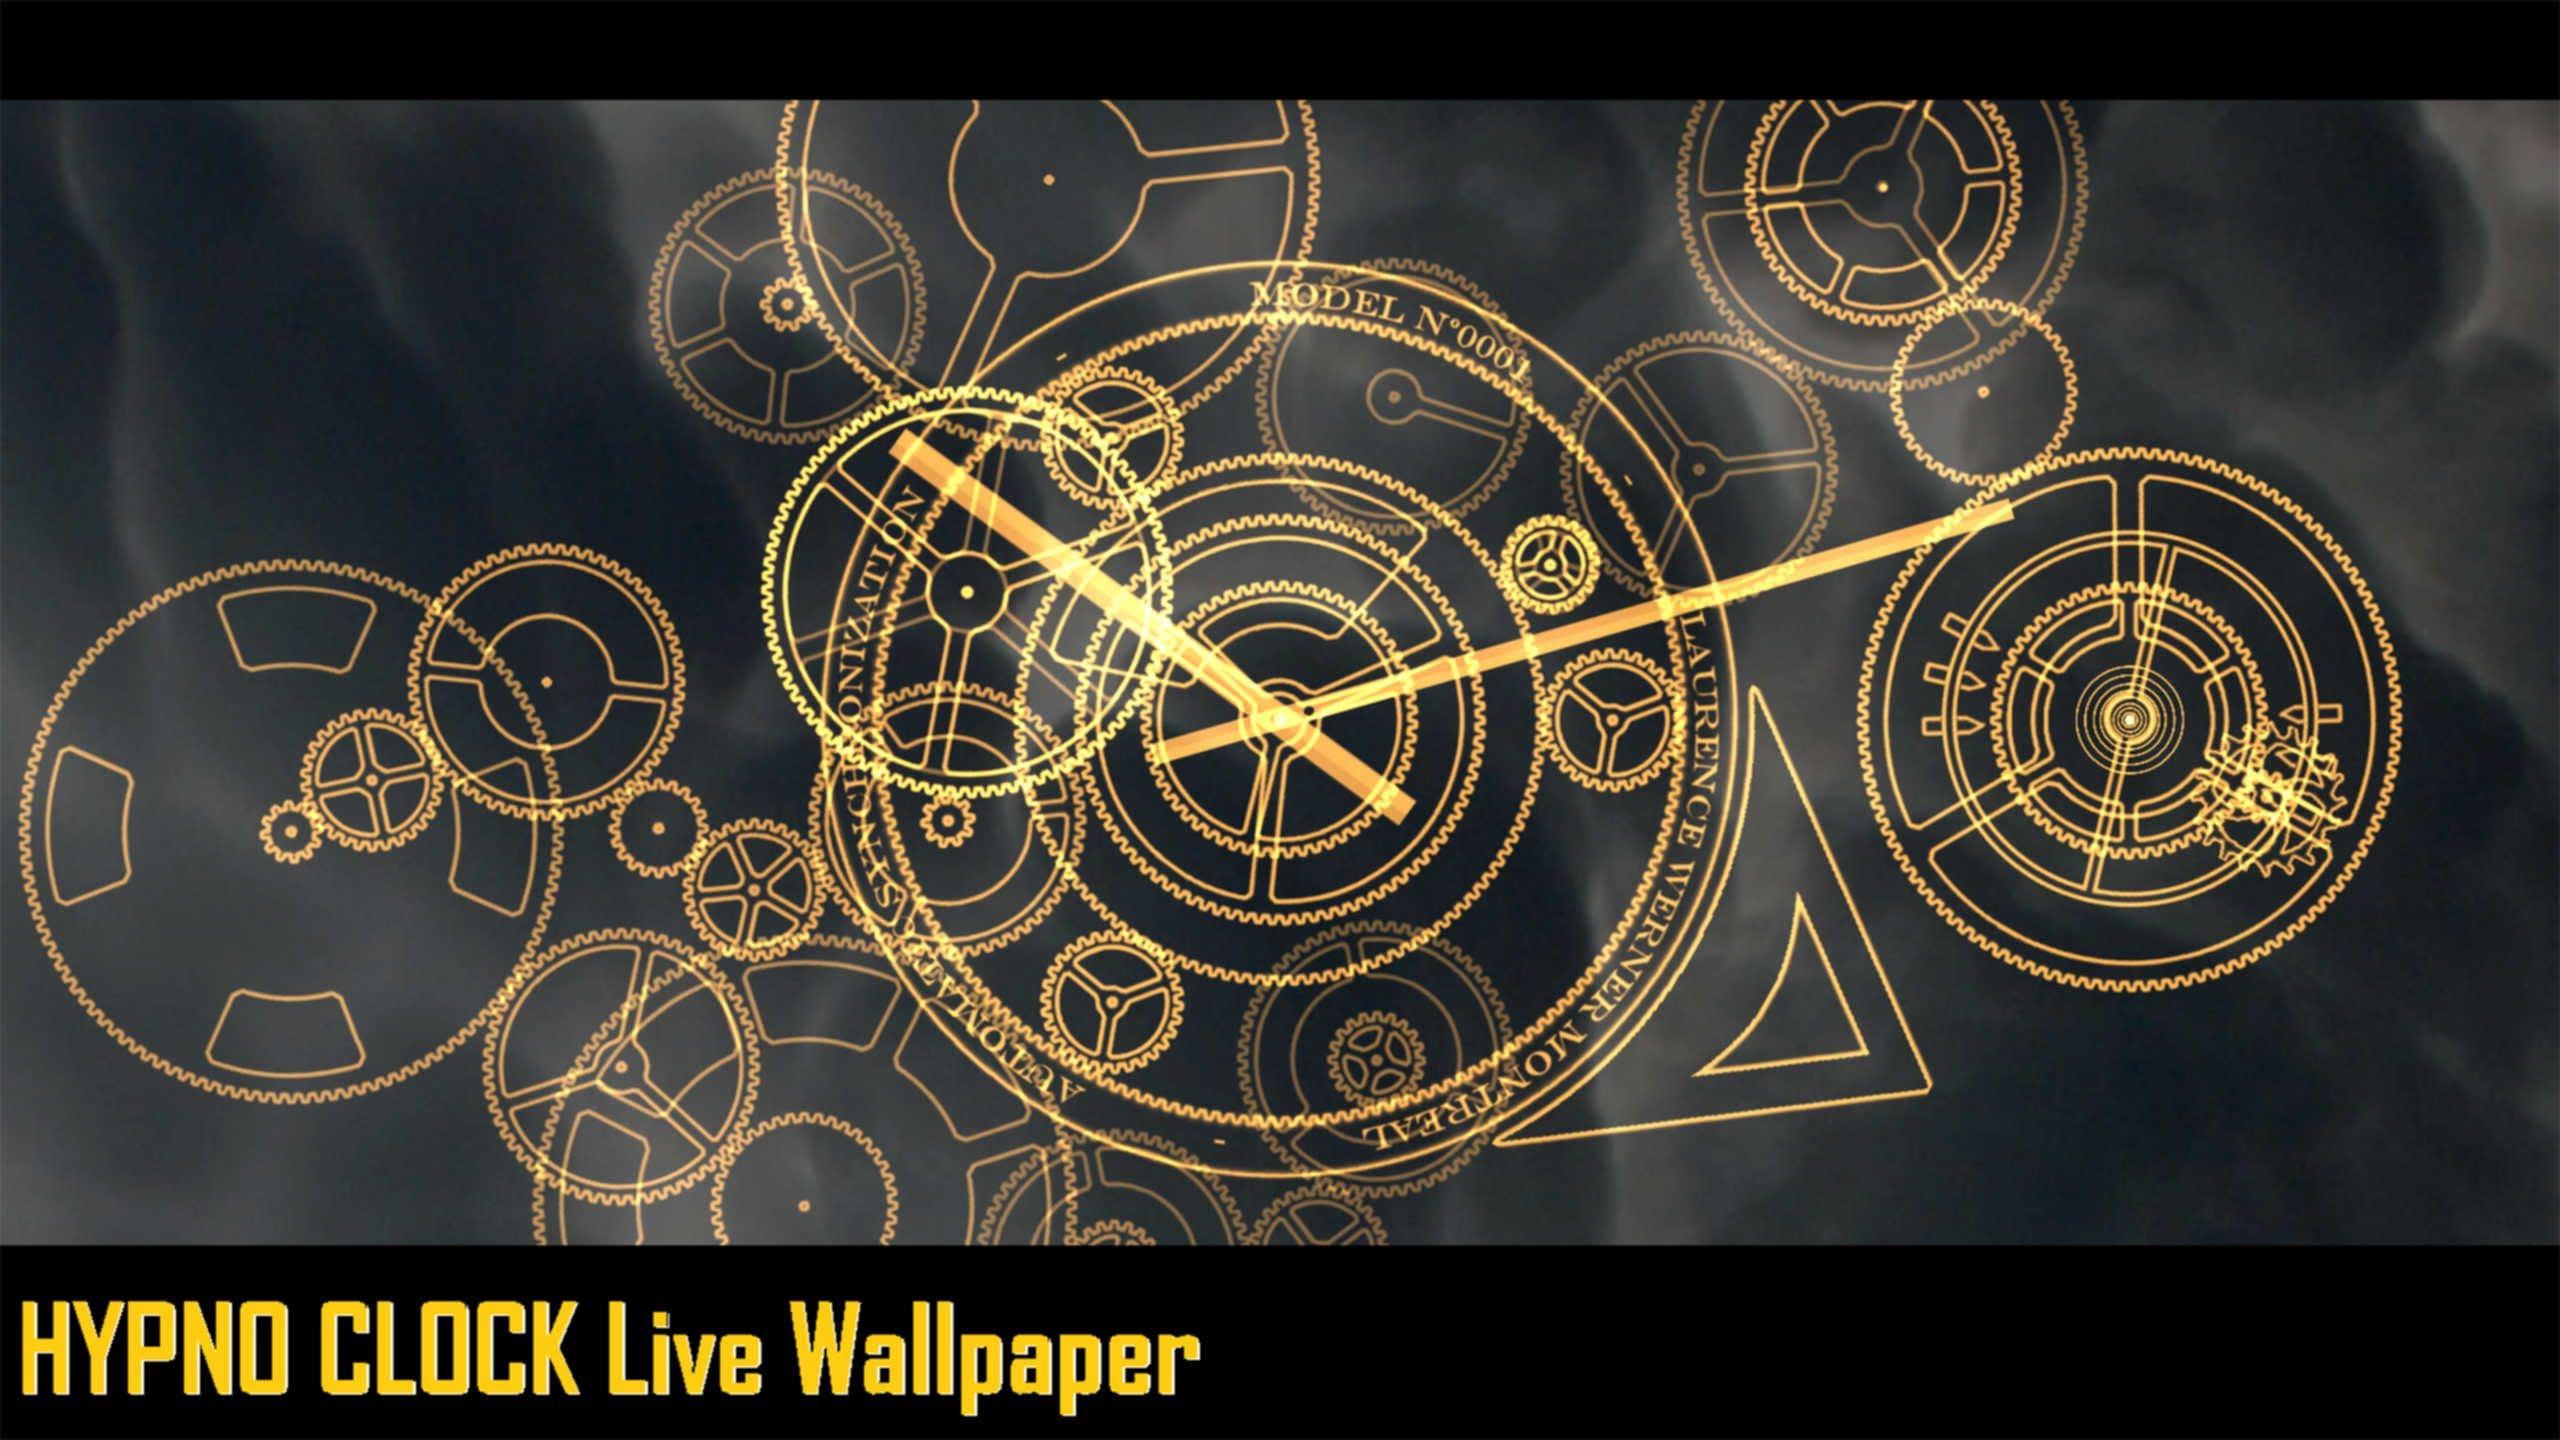 Clock Wallpaper for iPhone